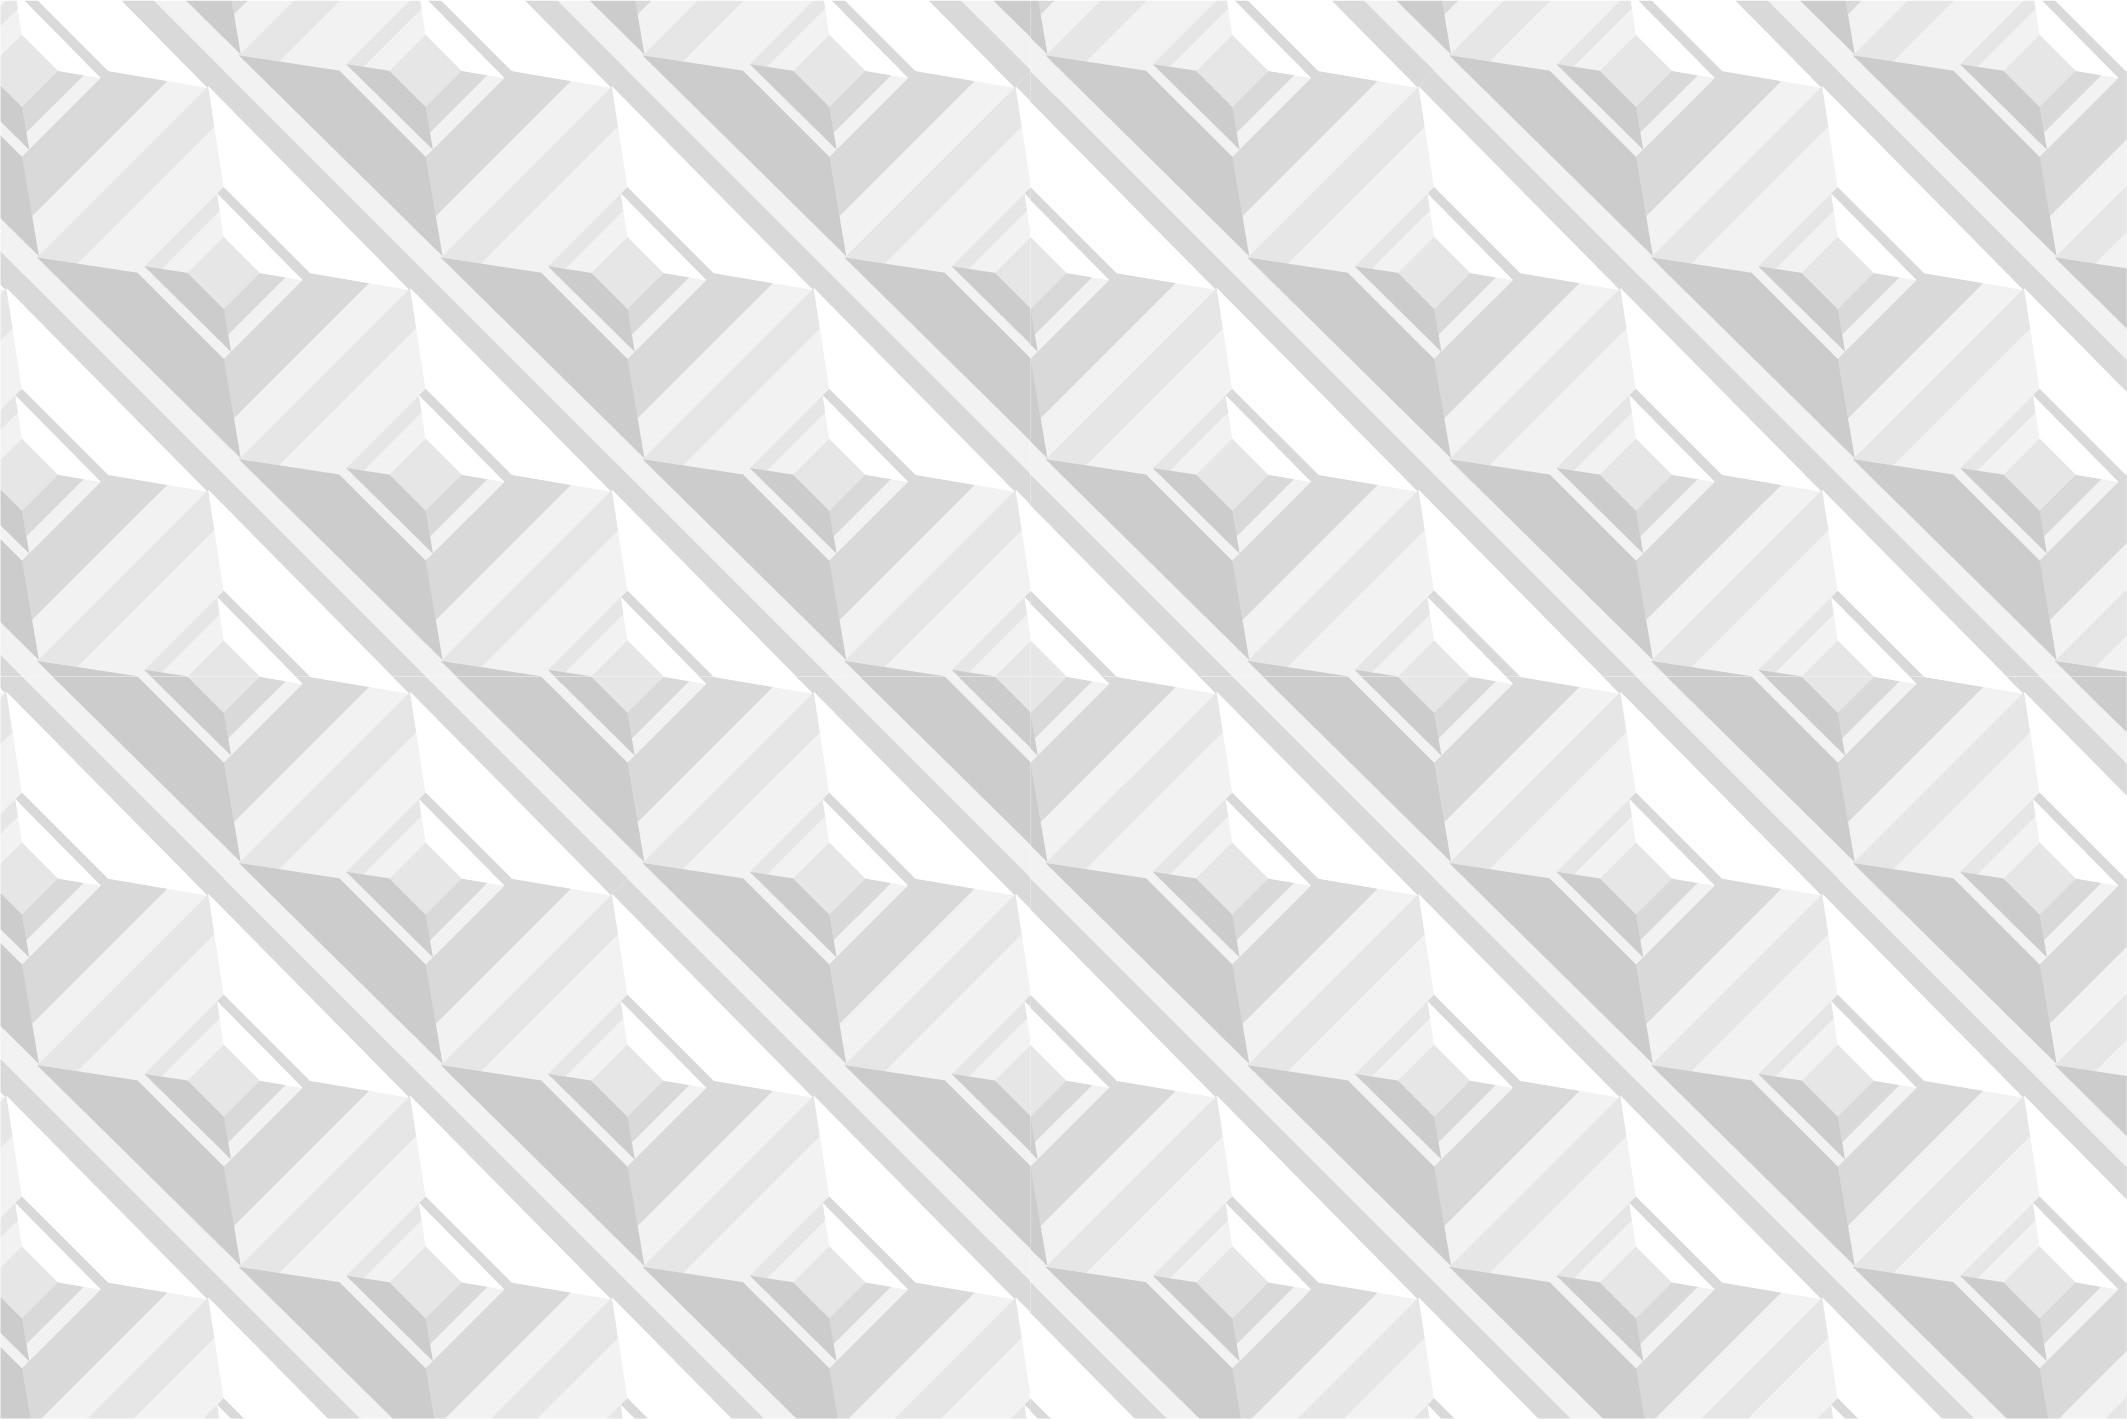 White geometric 3d seamless textures example image 11